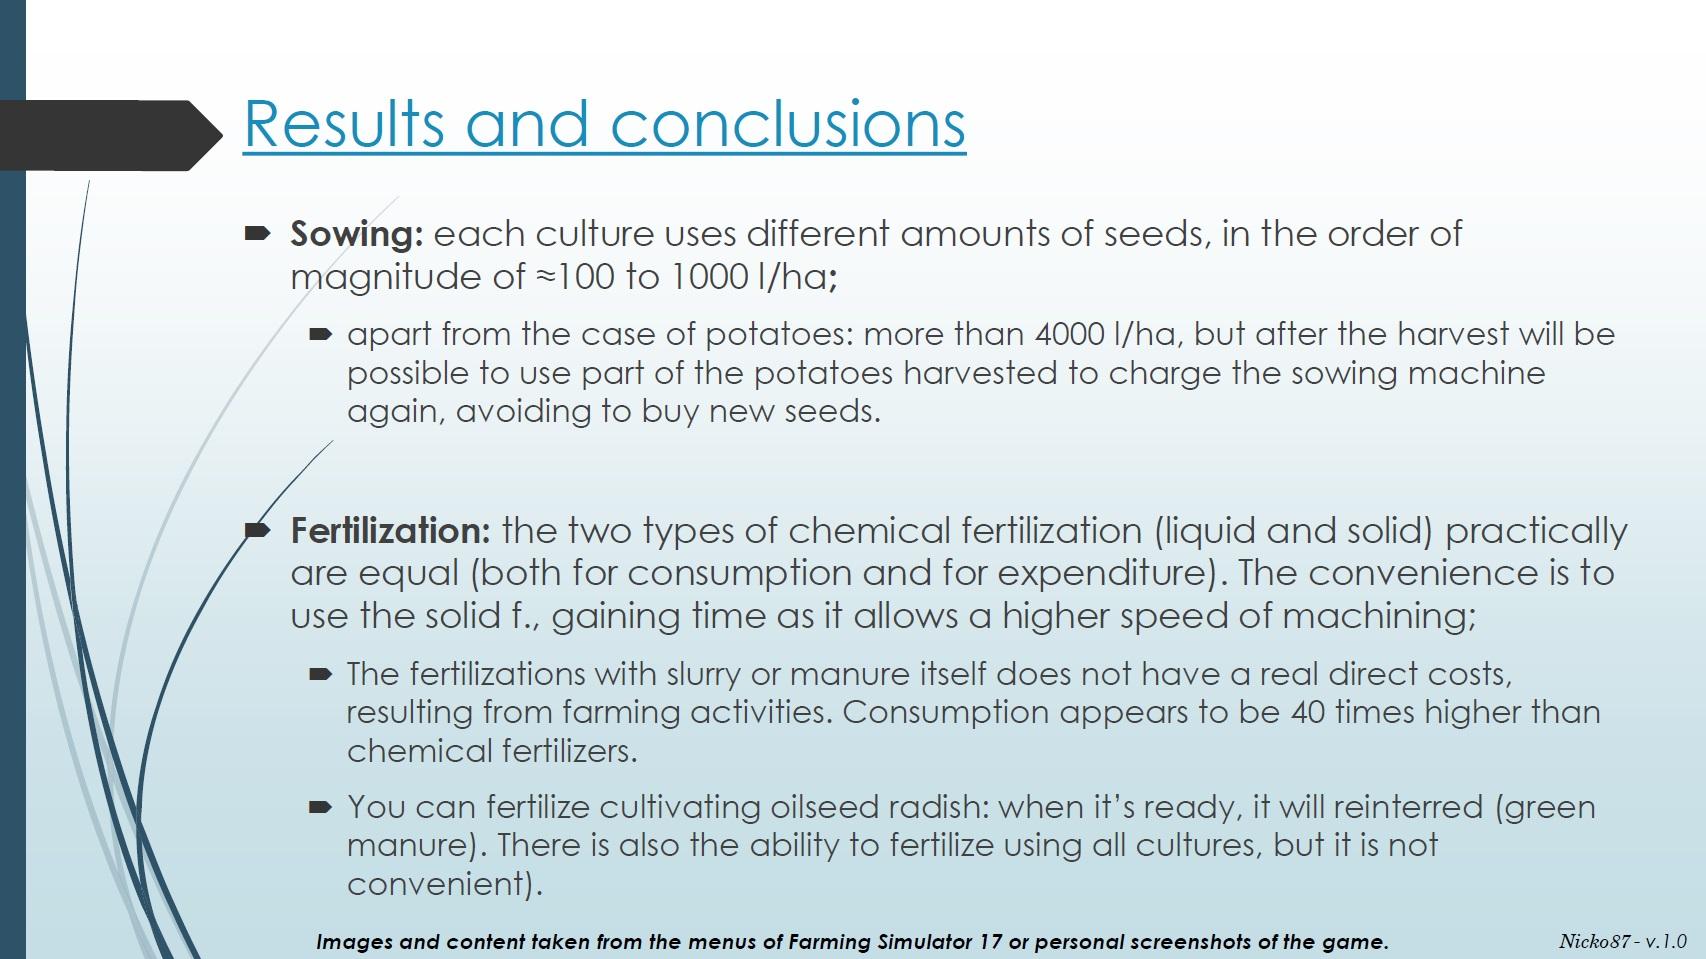 steam community guide uso semi fertilizzante seeds  steam community guide uso semi fertilizzante seeds fertilizer usage <fs17>